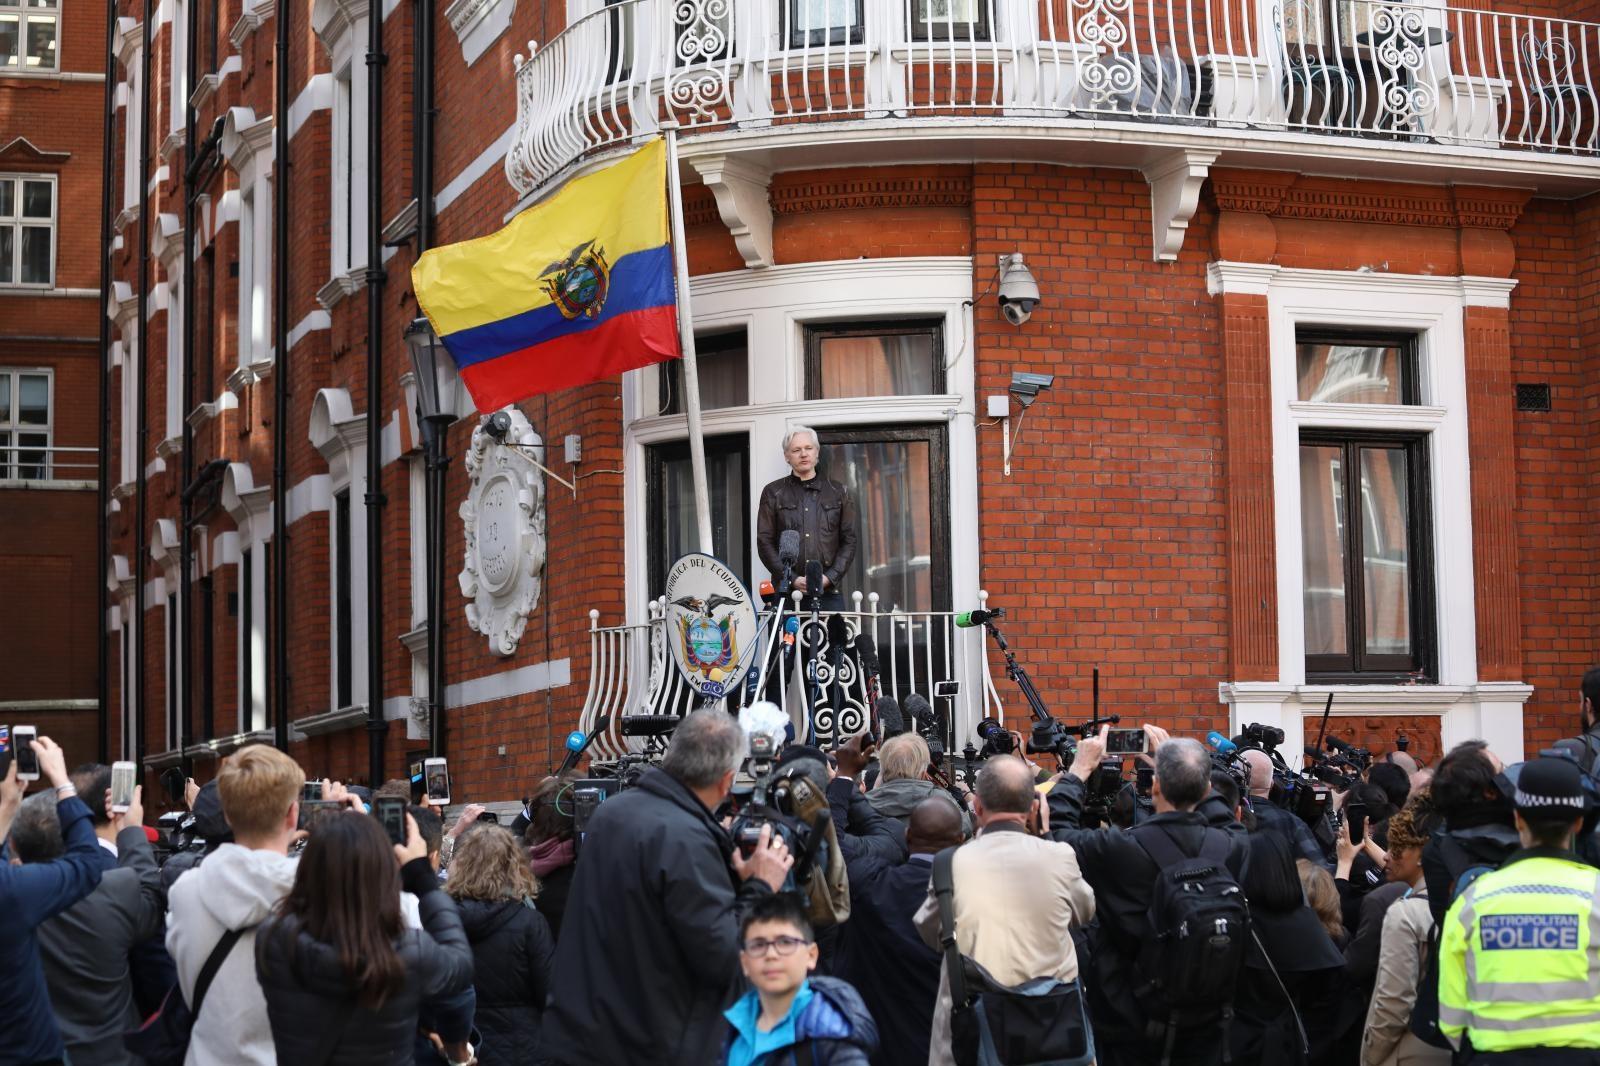 Julian Assange, veleposlaništvo Ekvadorja Vir:Pixsell